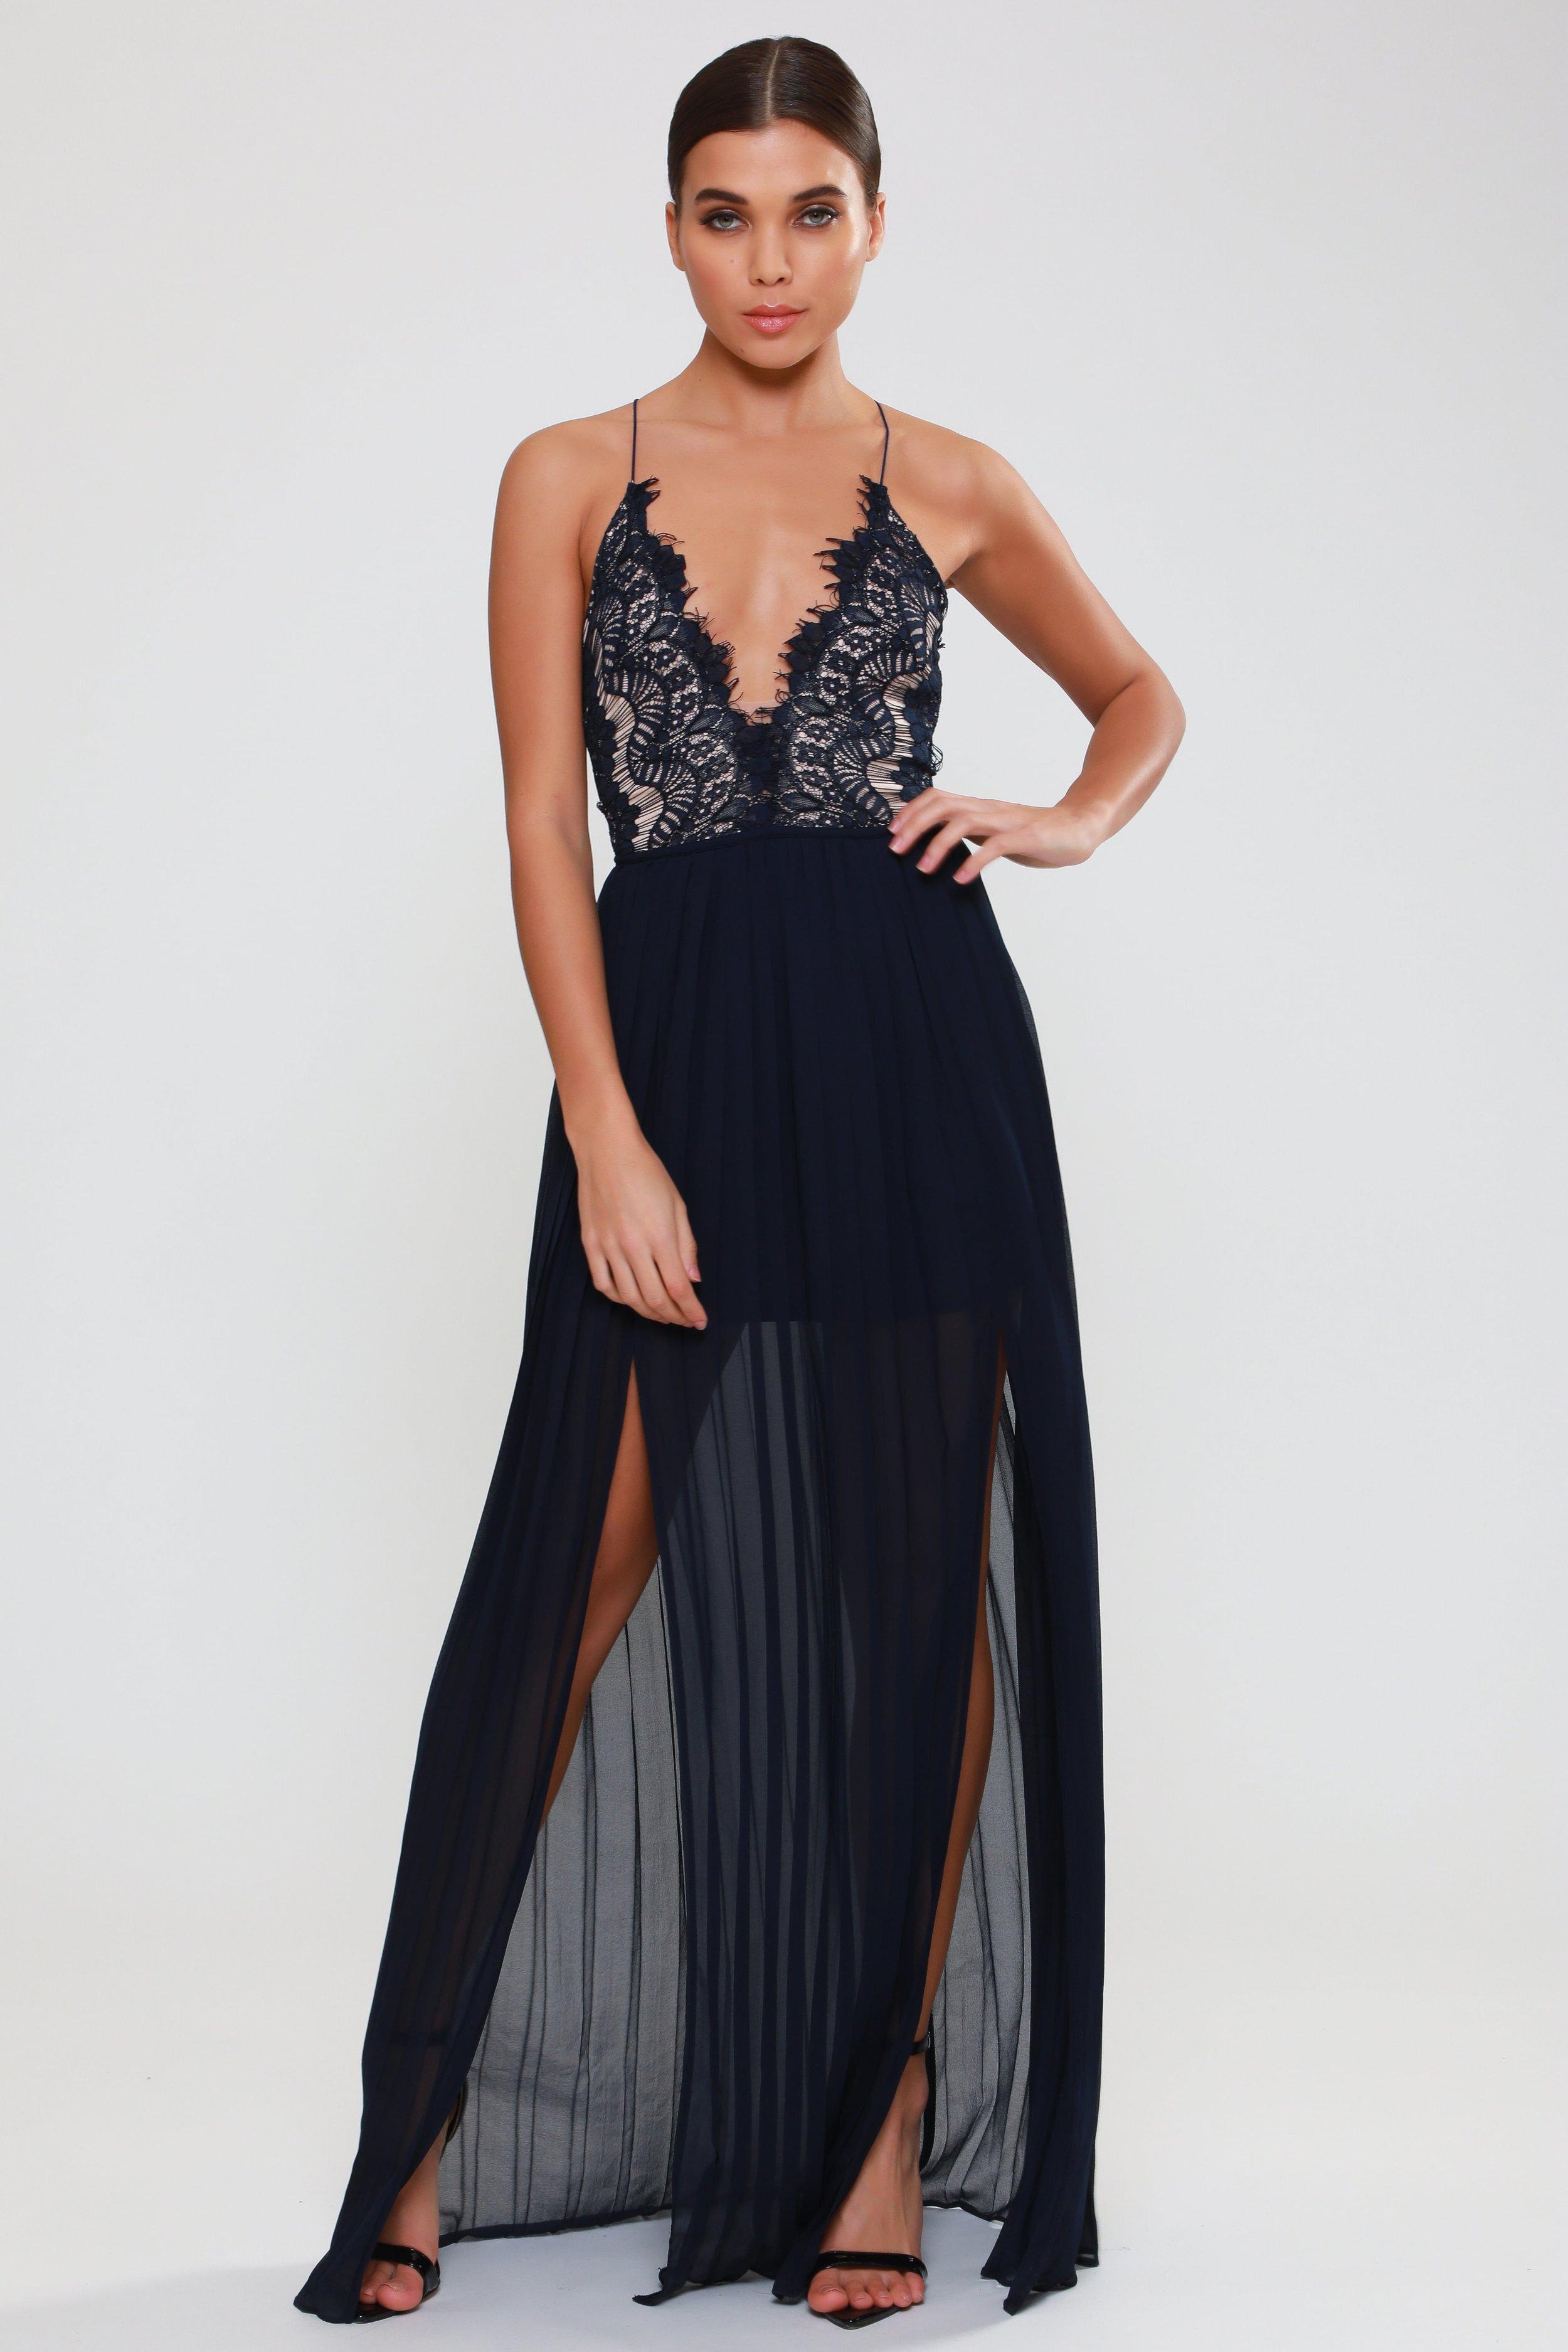 Eyelash Lace Double  Split Maxi Dress   £69.00